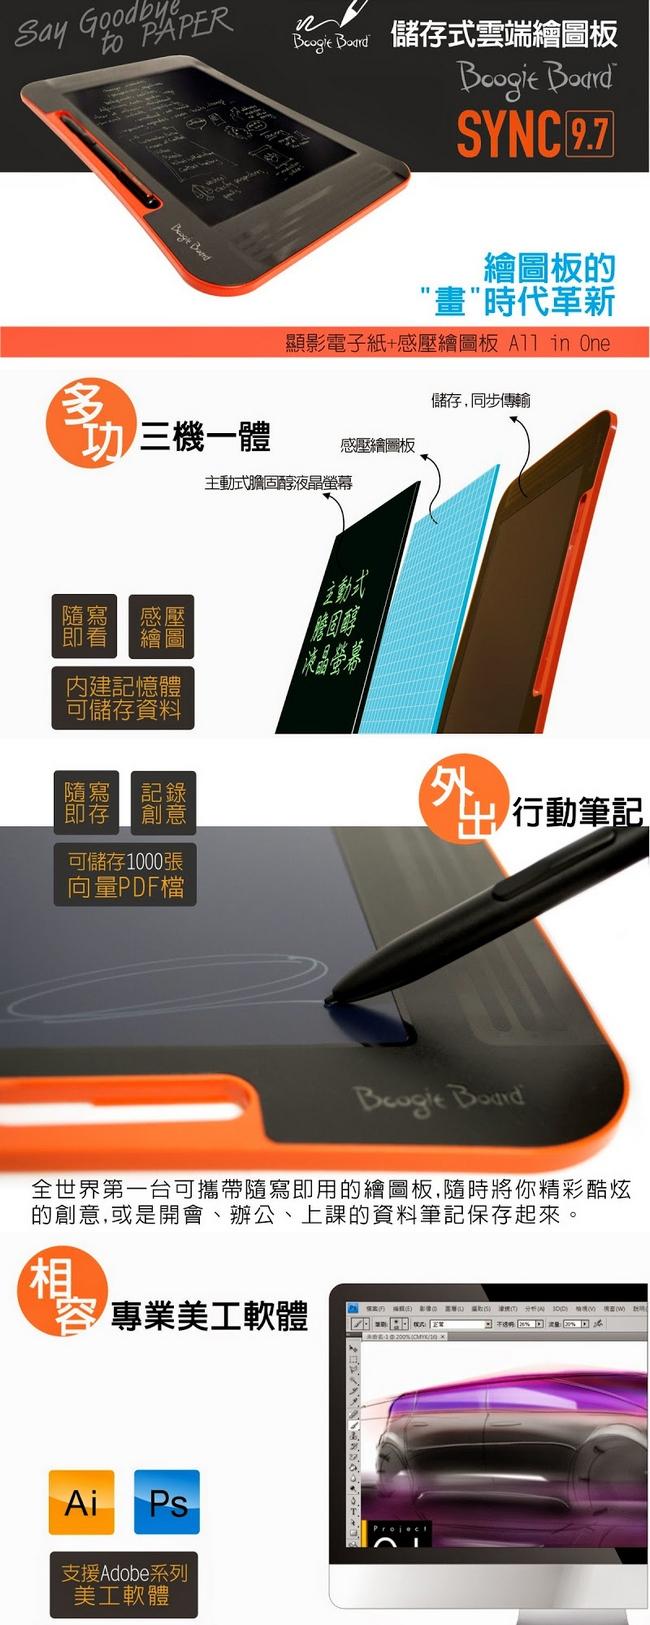 BoogieBoard-Sync-9.7吋儲存式雲端繪圖板